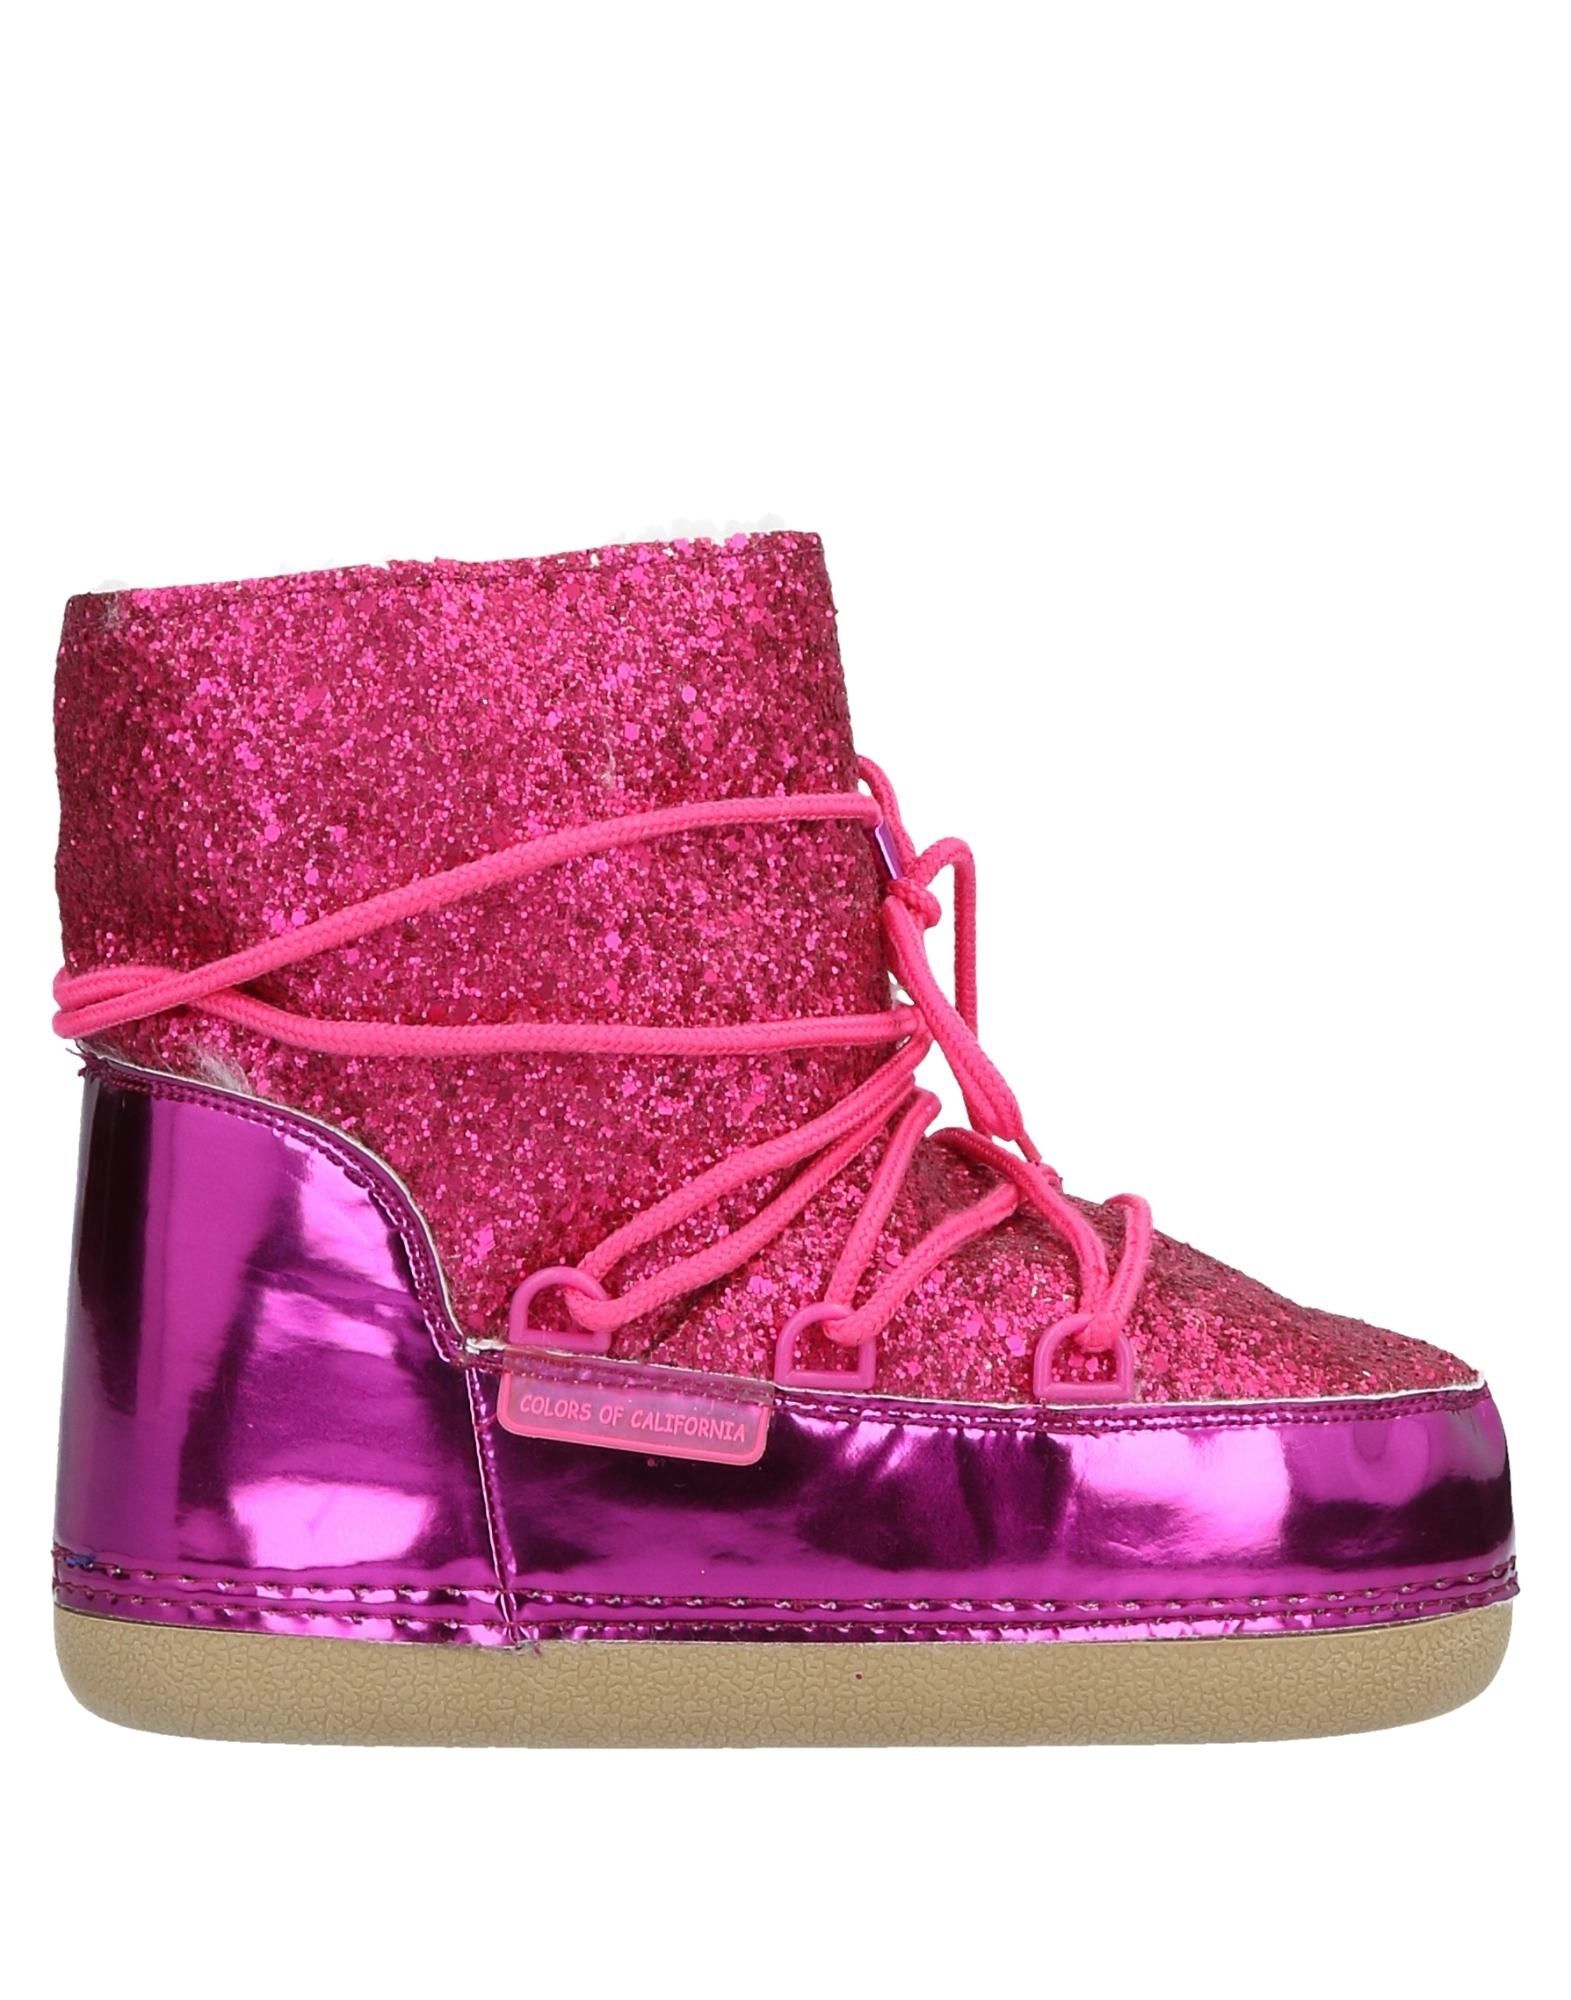 Colors Of California Stiefelette beliebte Damen  11574531CV Gute Qualität beliebte Stiefelette Schuhe 262925